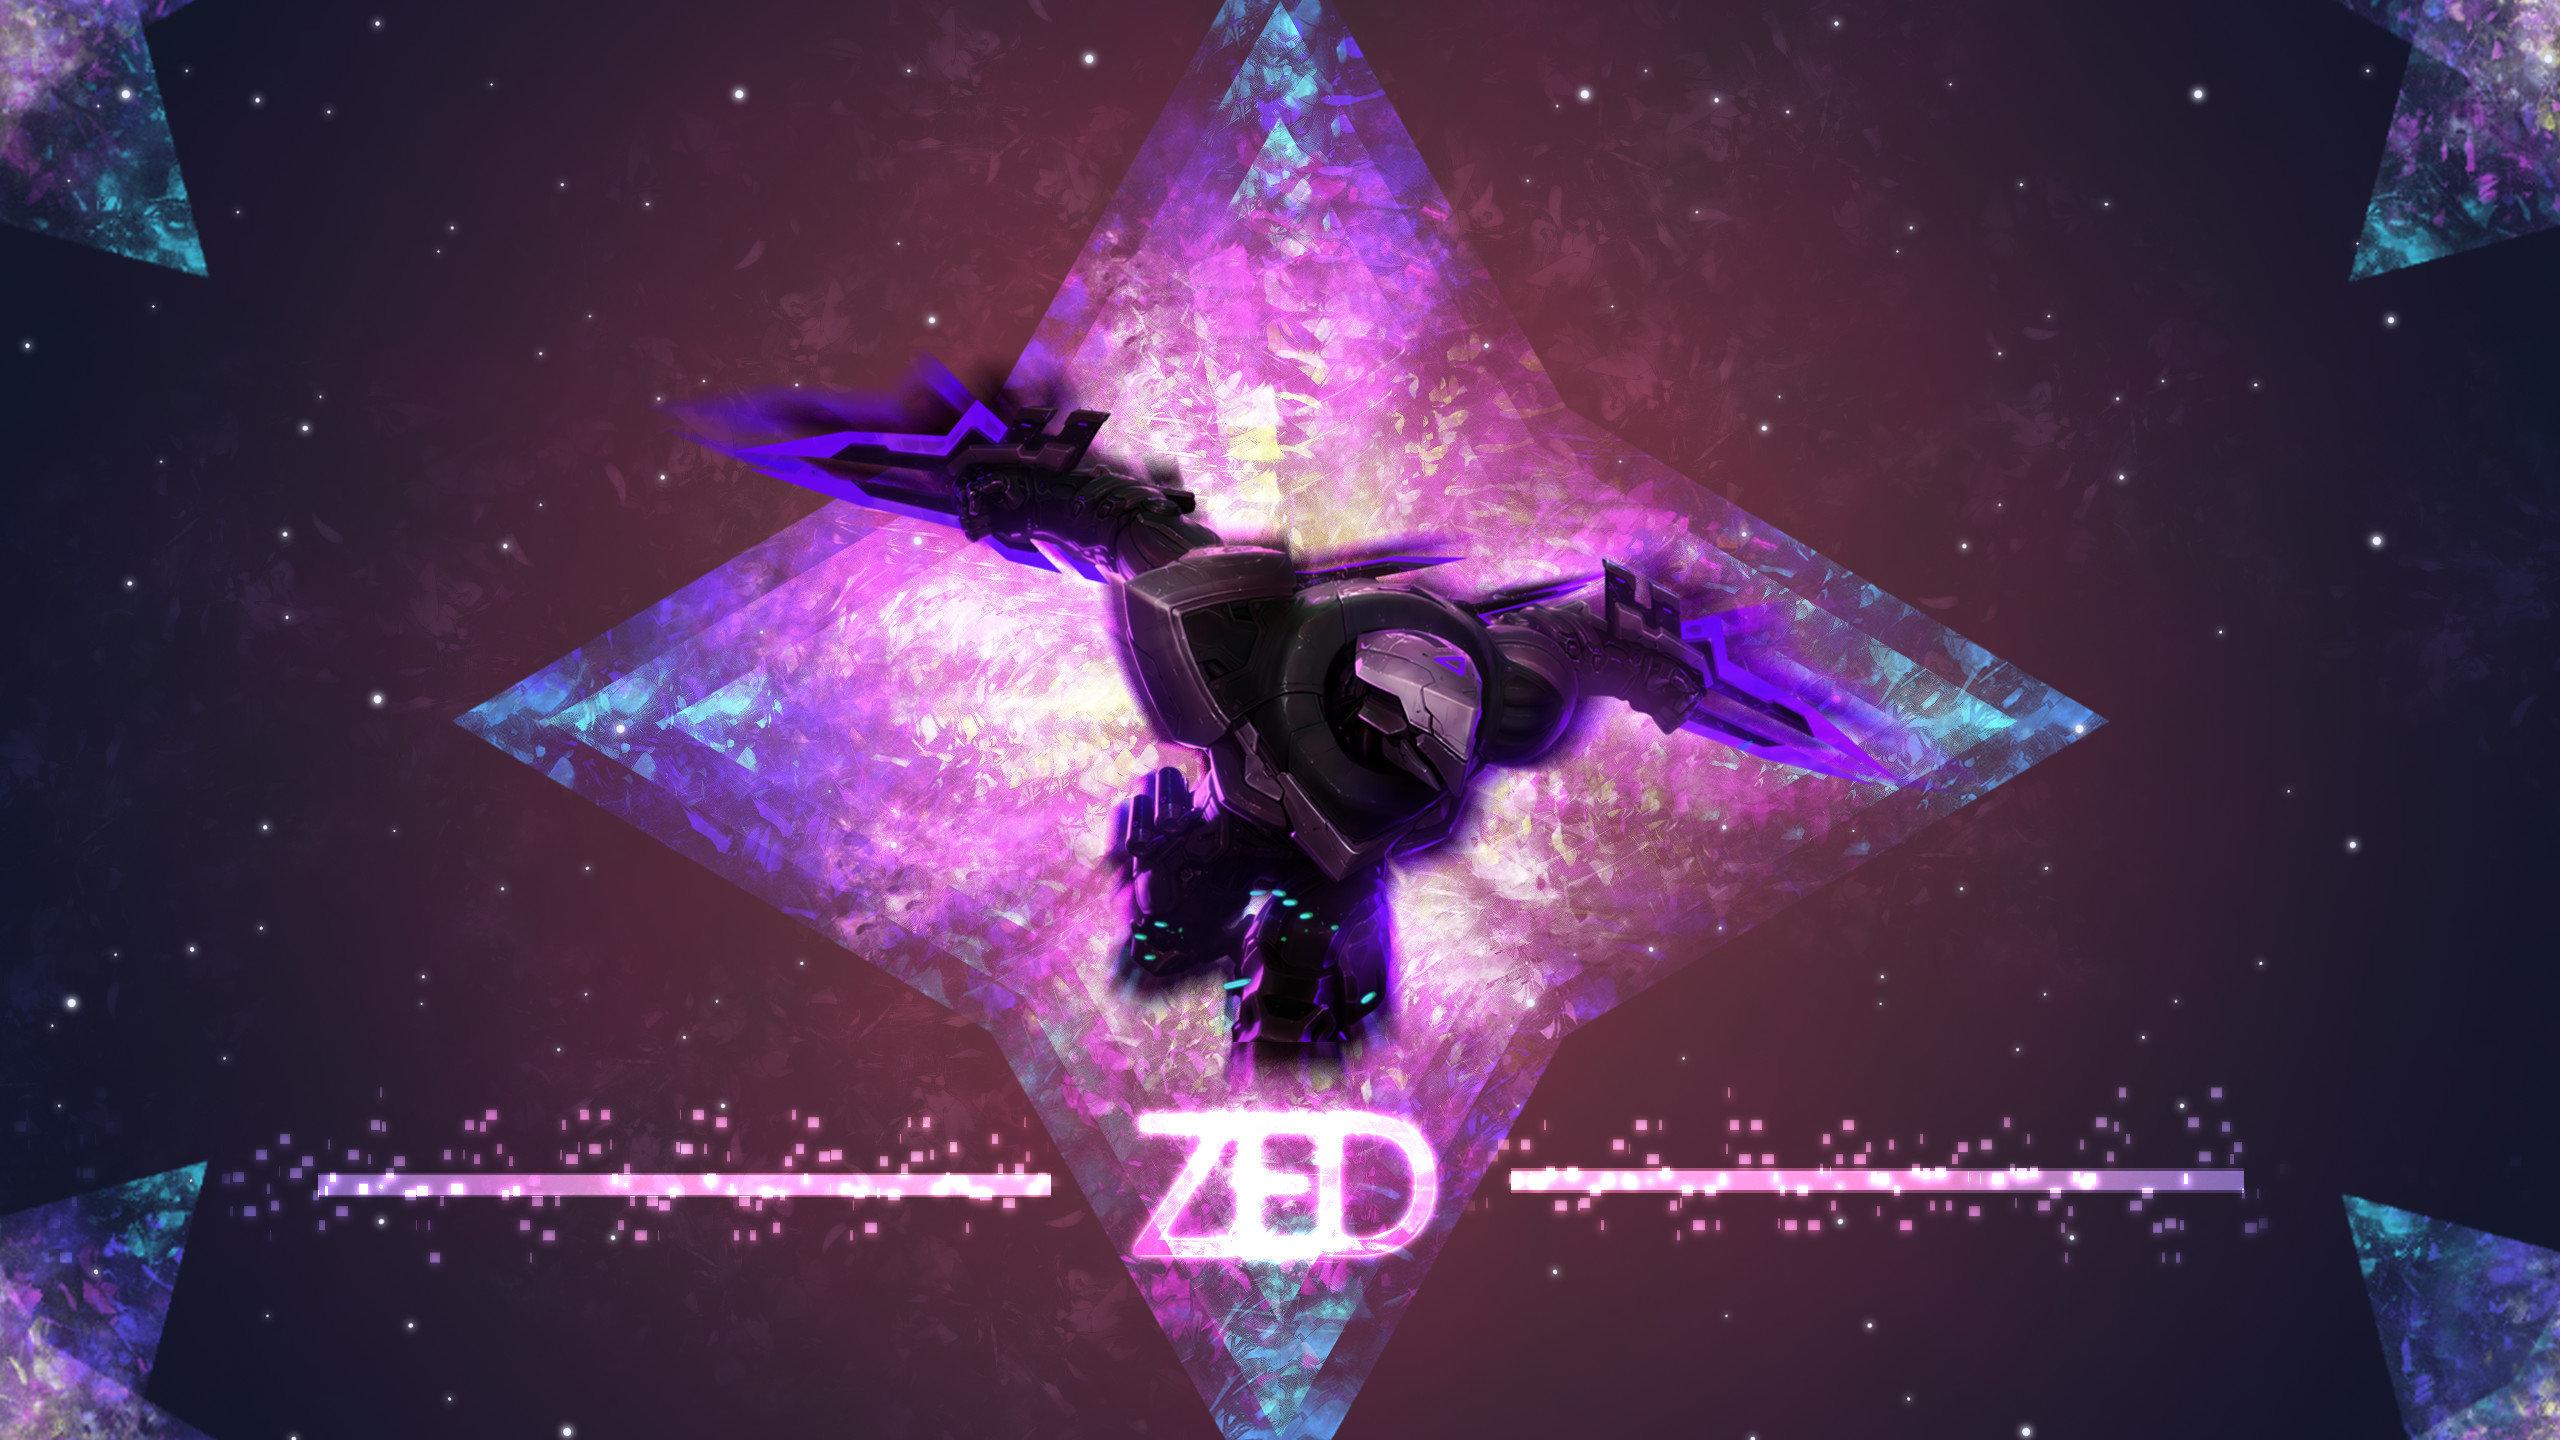 Zed (League Of Legends) wallpapers HD for desktop backgrounds